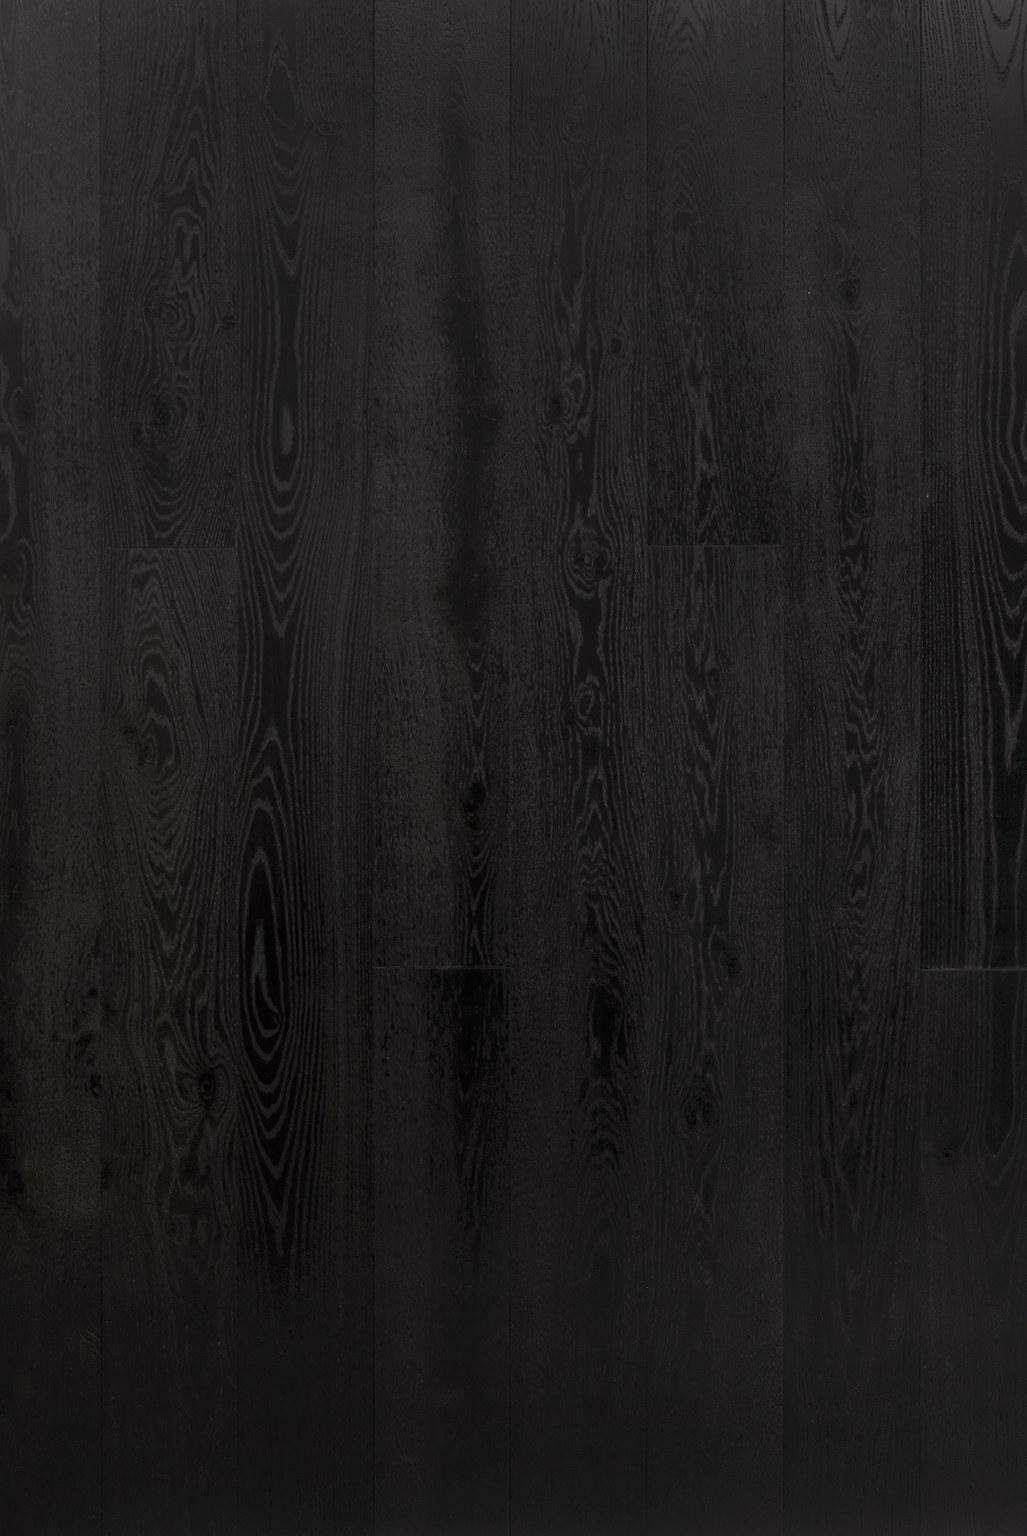 Timberwise parketti lankkuparketti puulattia wooden floor parquet plank Tammi Oak Wenge_2D1